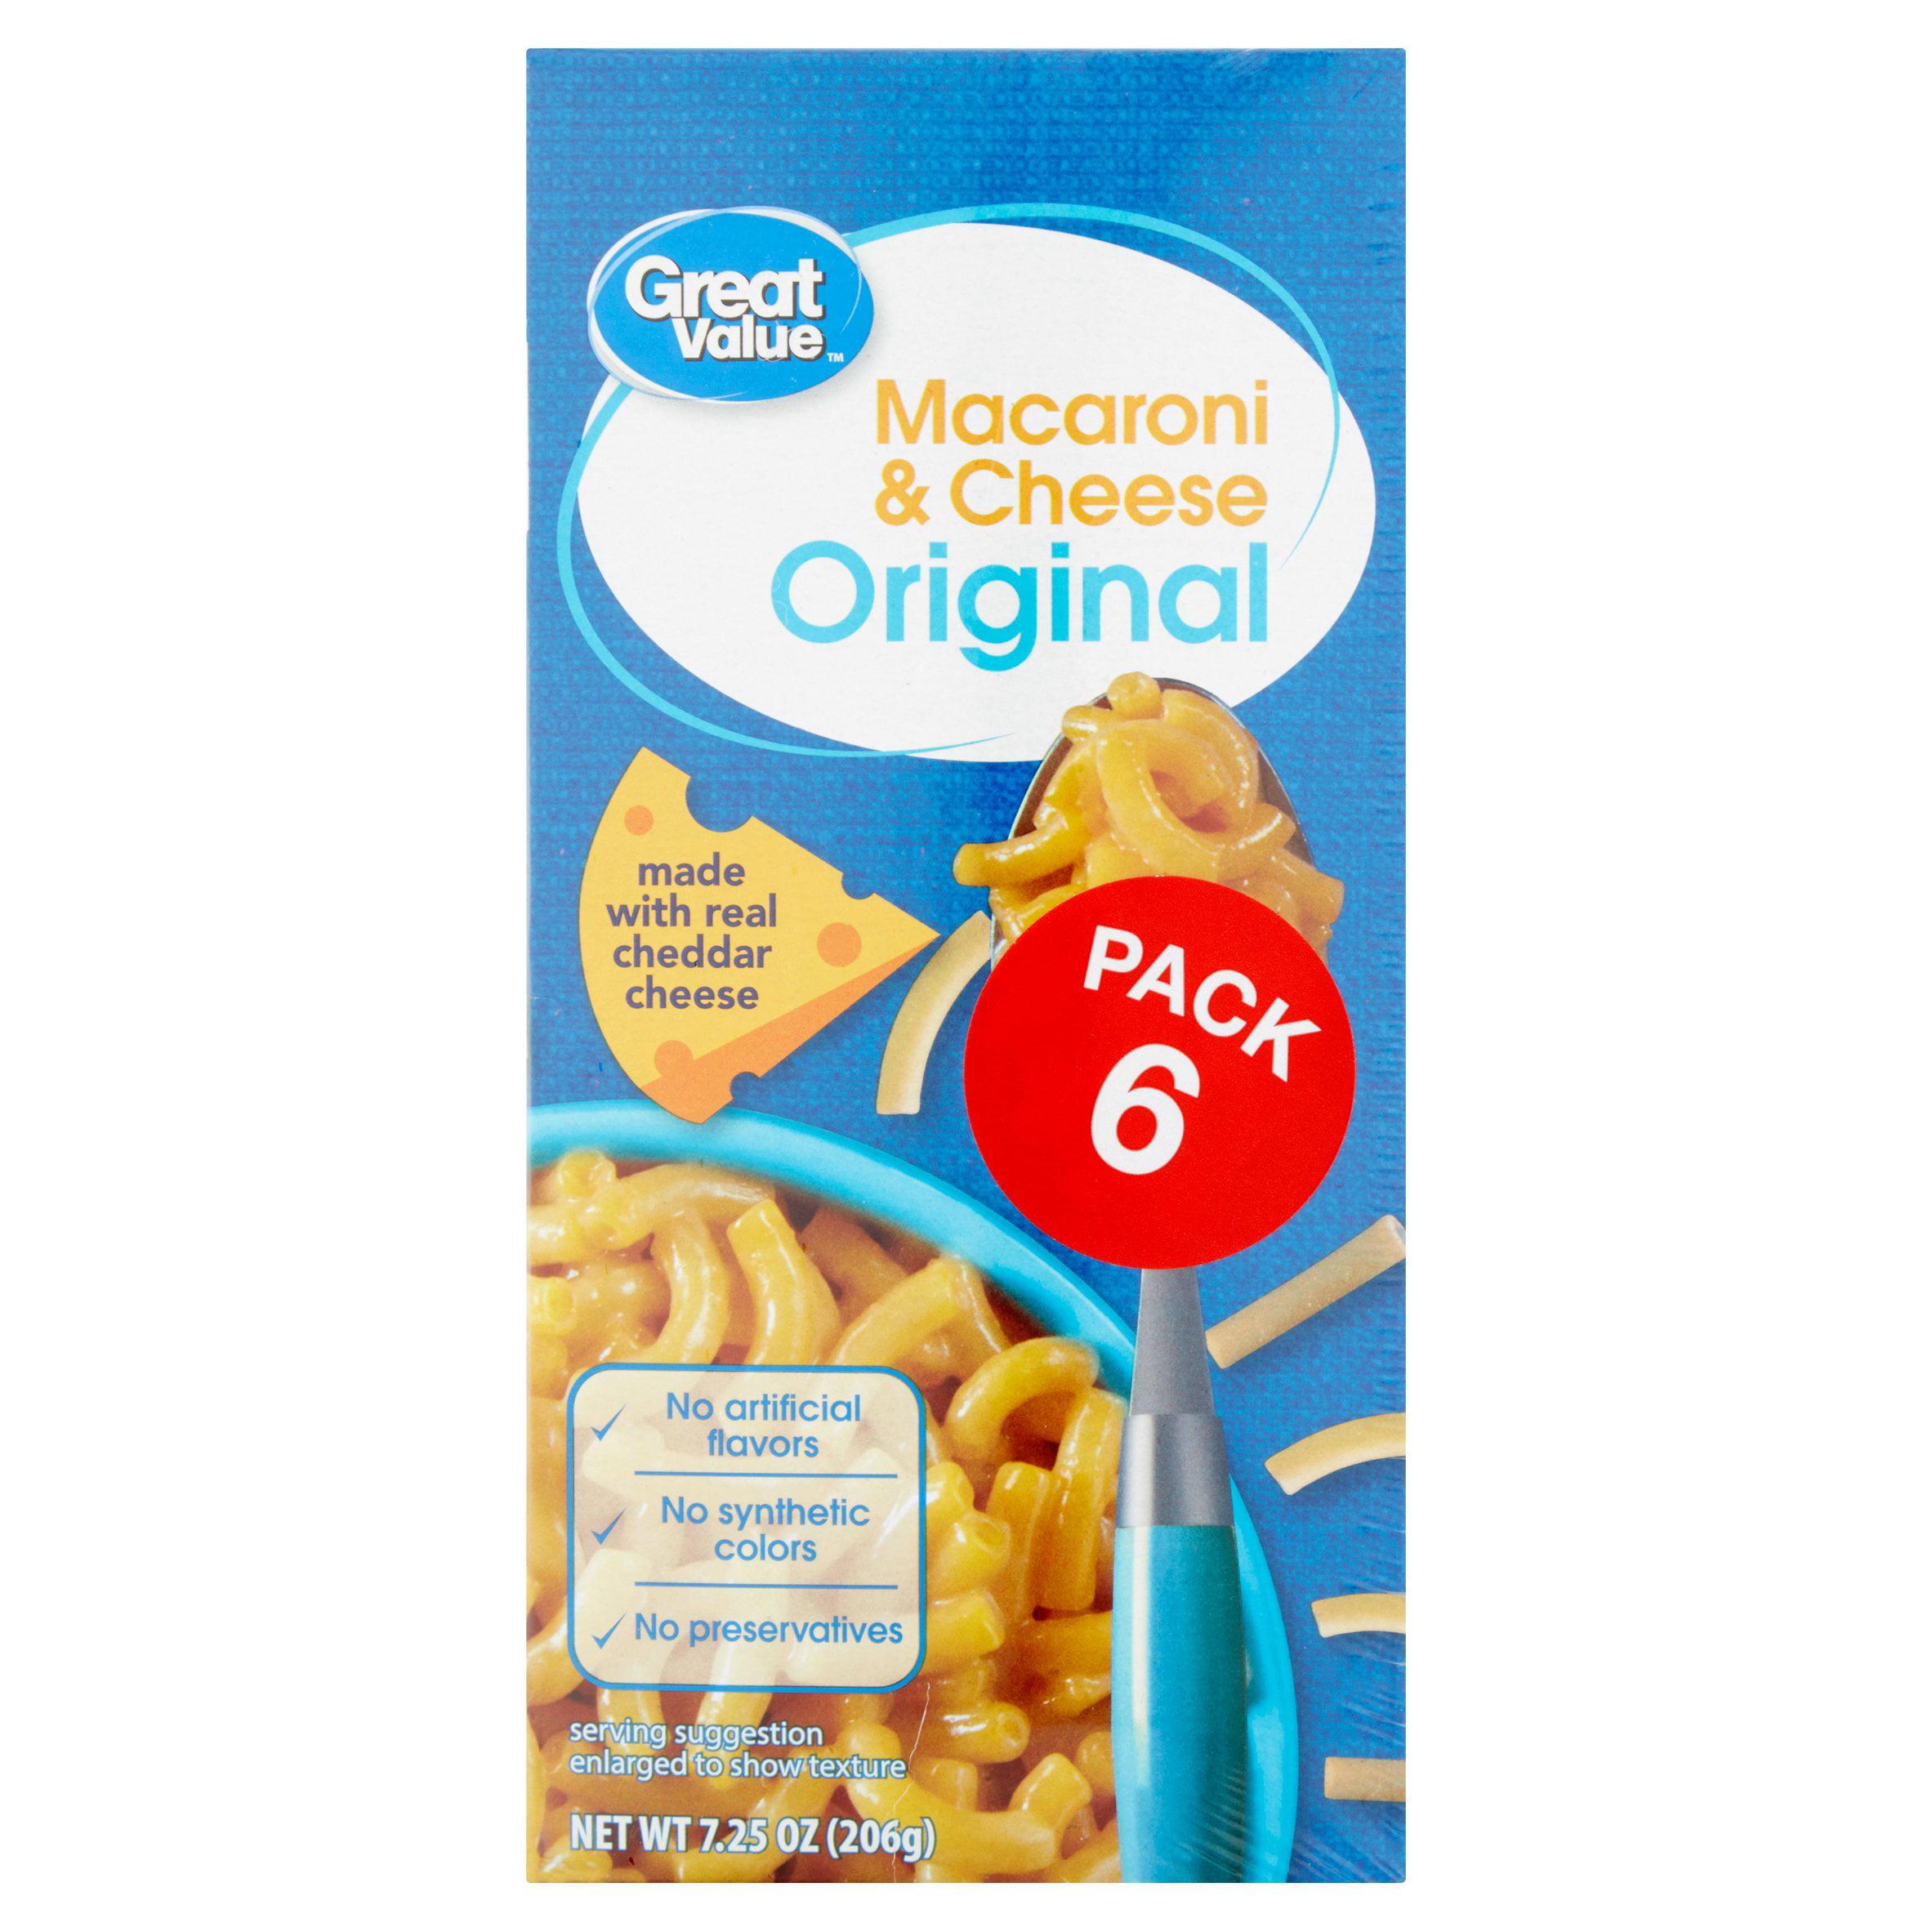 Great Value Original Macaroni & Cheese, 6 Count